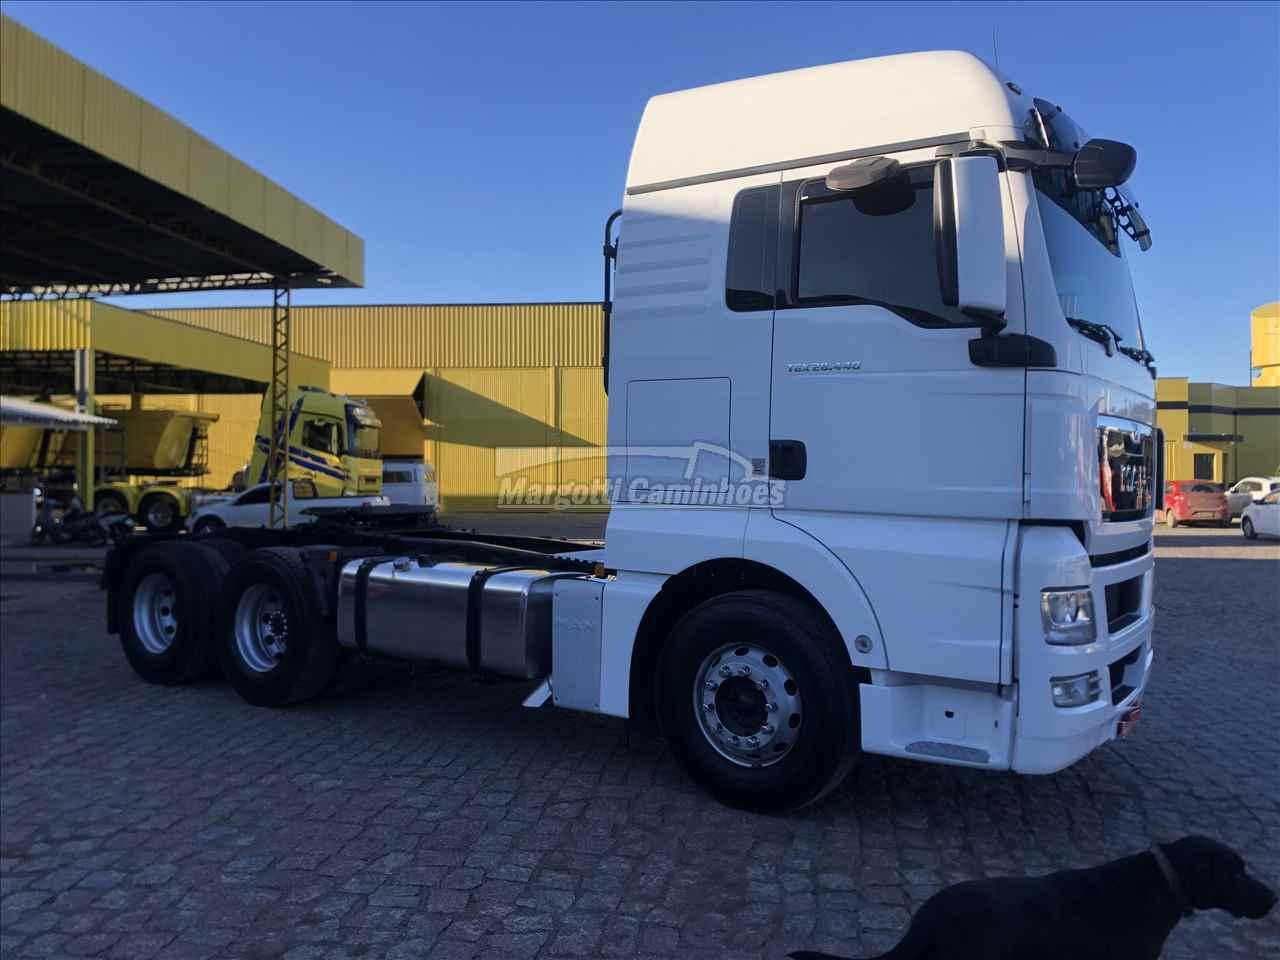 CAMINHAO MAN TGX 28 440 Cavalo Mecânico Truck 6x2 Margotti Caminhões TUBARAO SANTA CATARINA SC